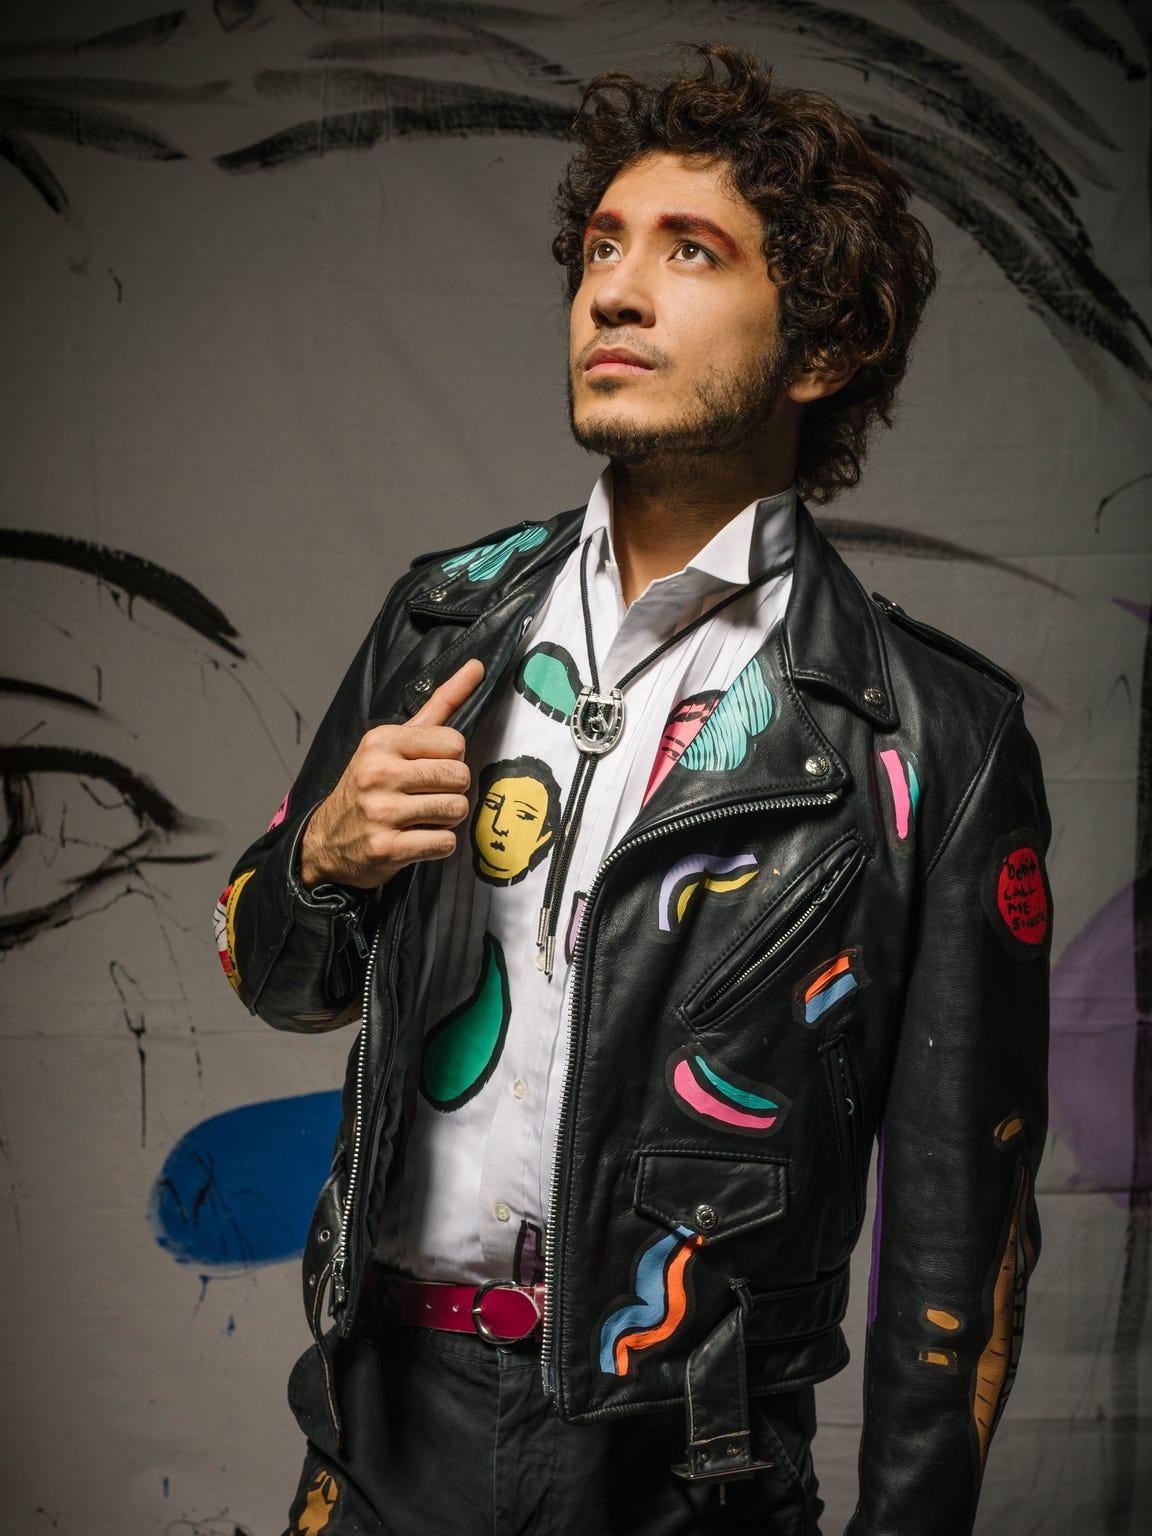 Zeus Lee in a custom Sofia Enriquez jacket, shirt and